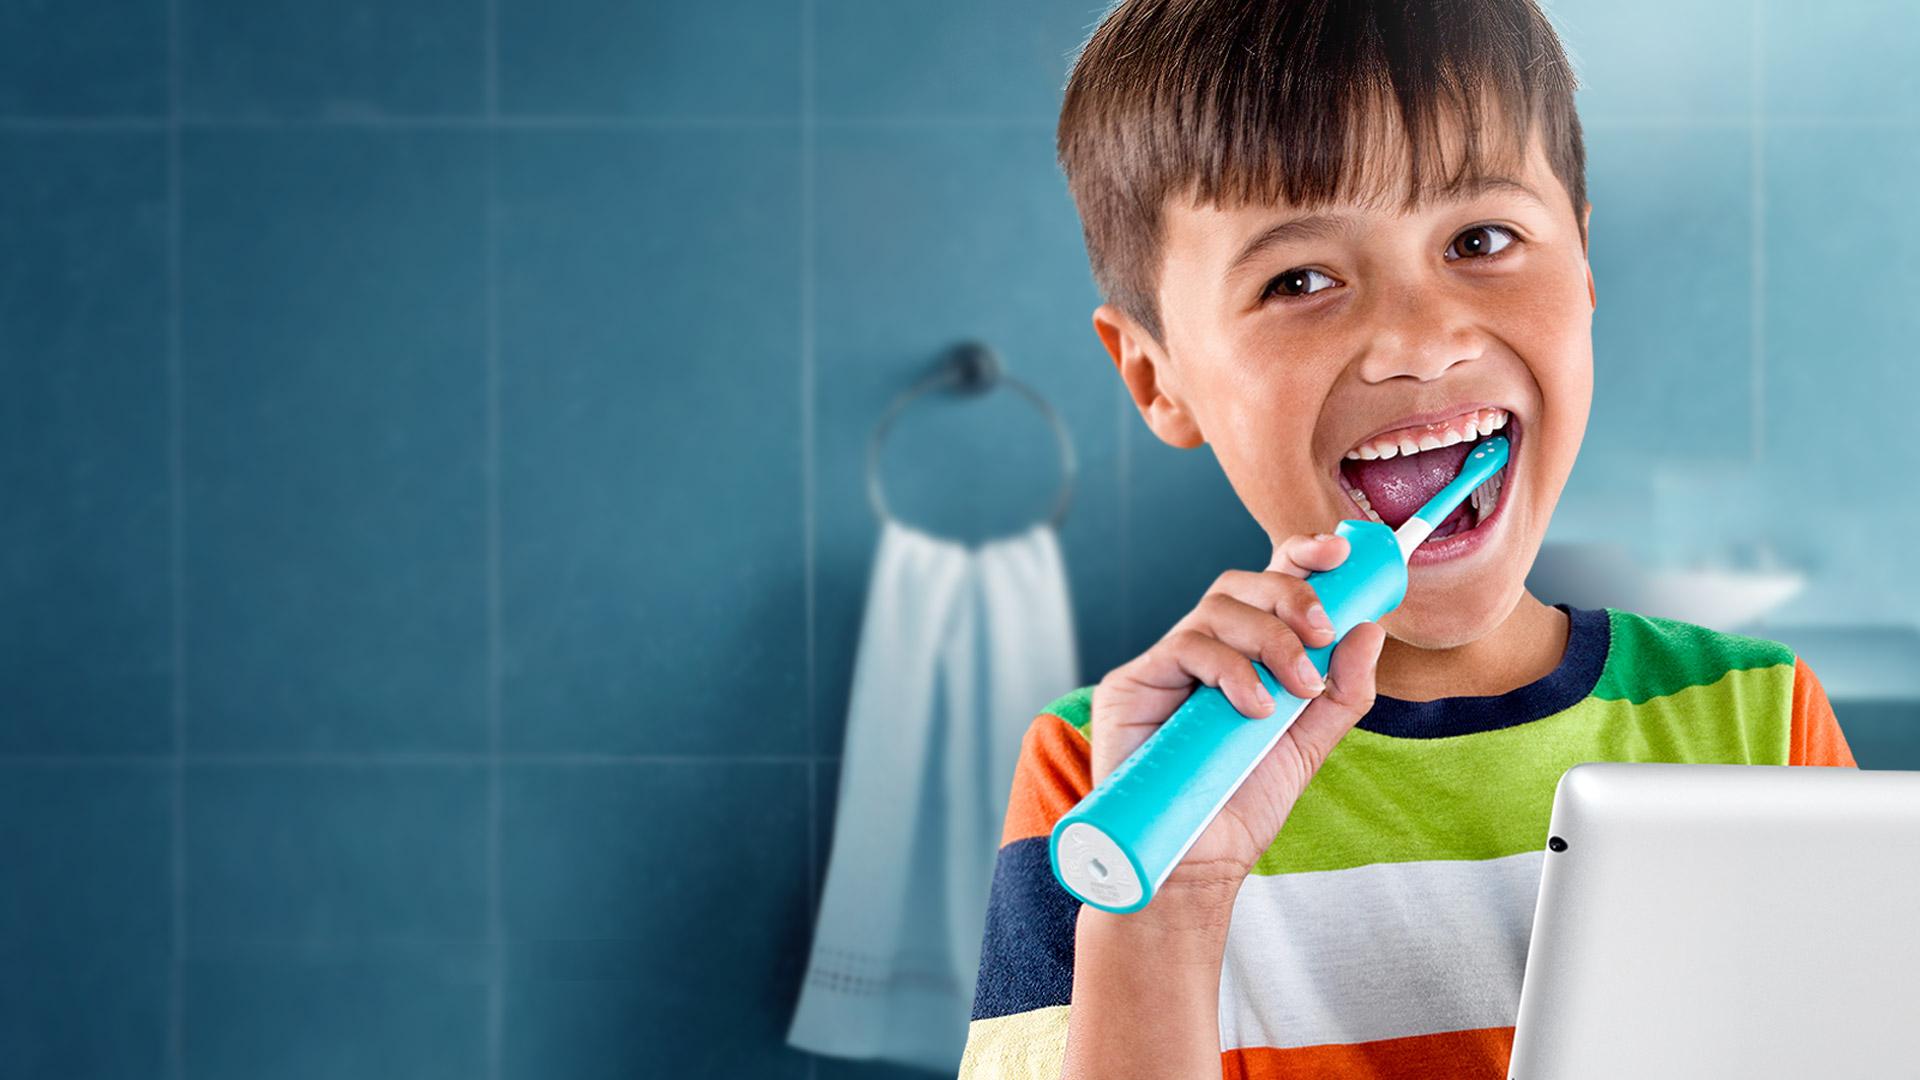 Sonicare for kids, Magnolia Dental, Dentist, Orlando